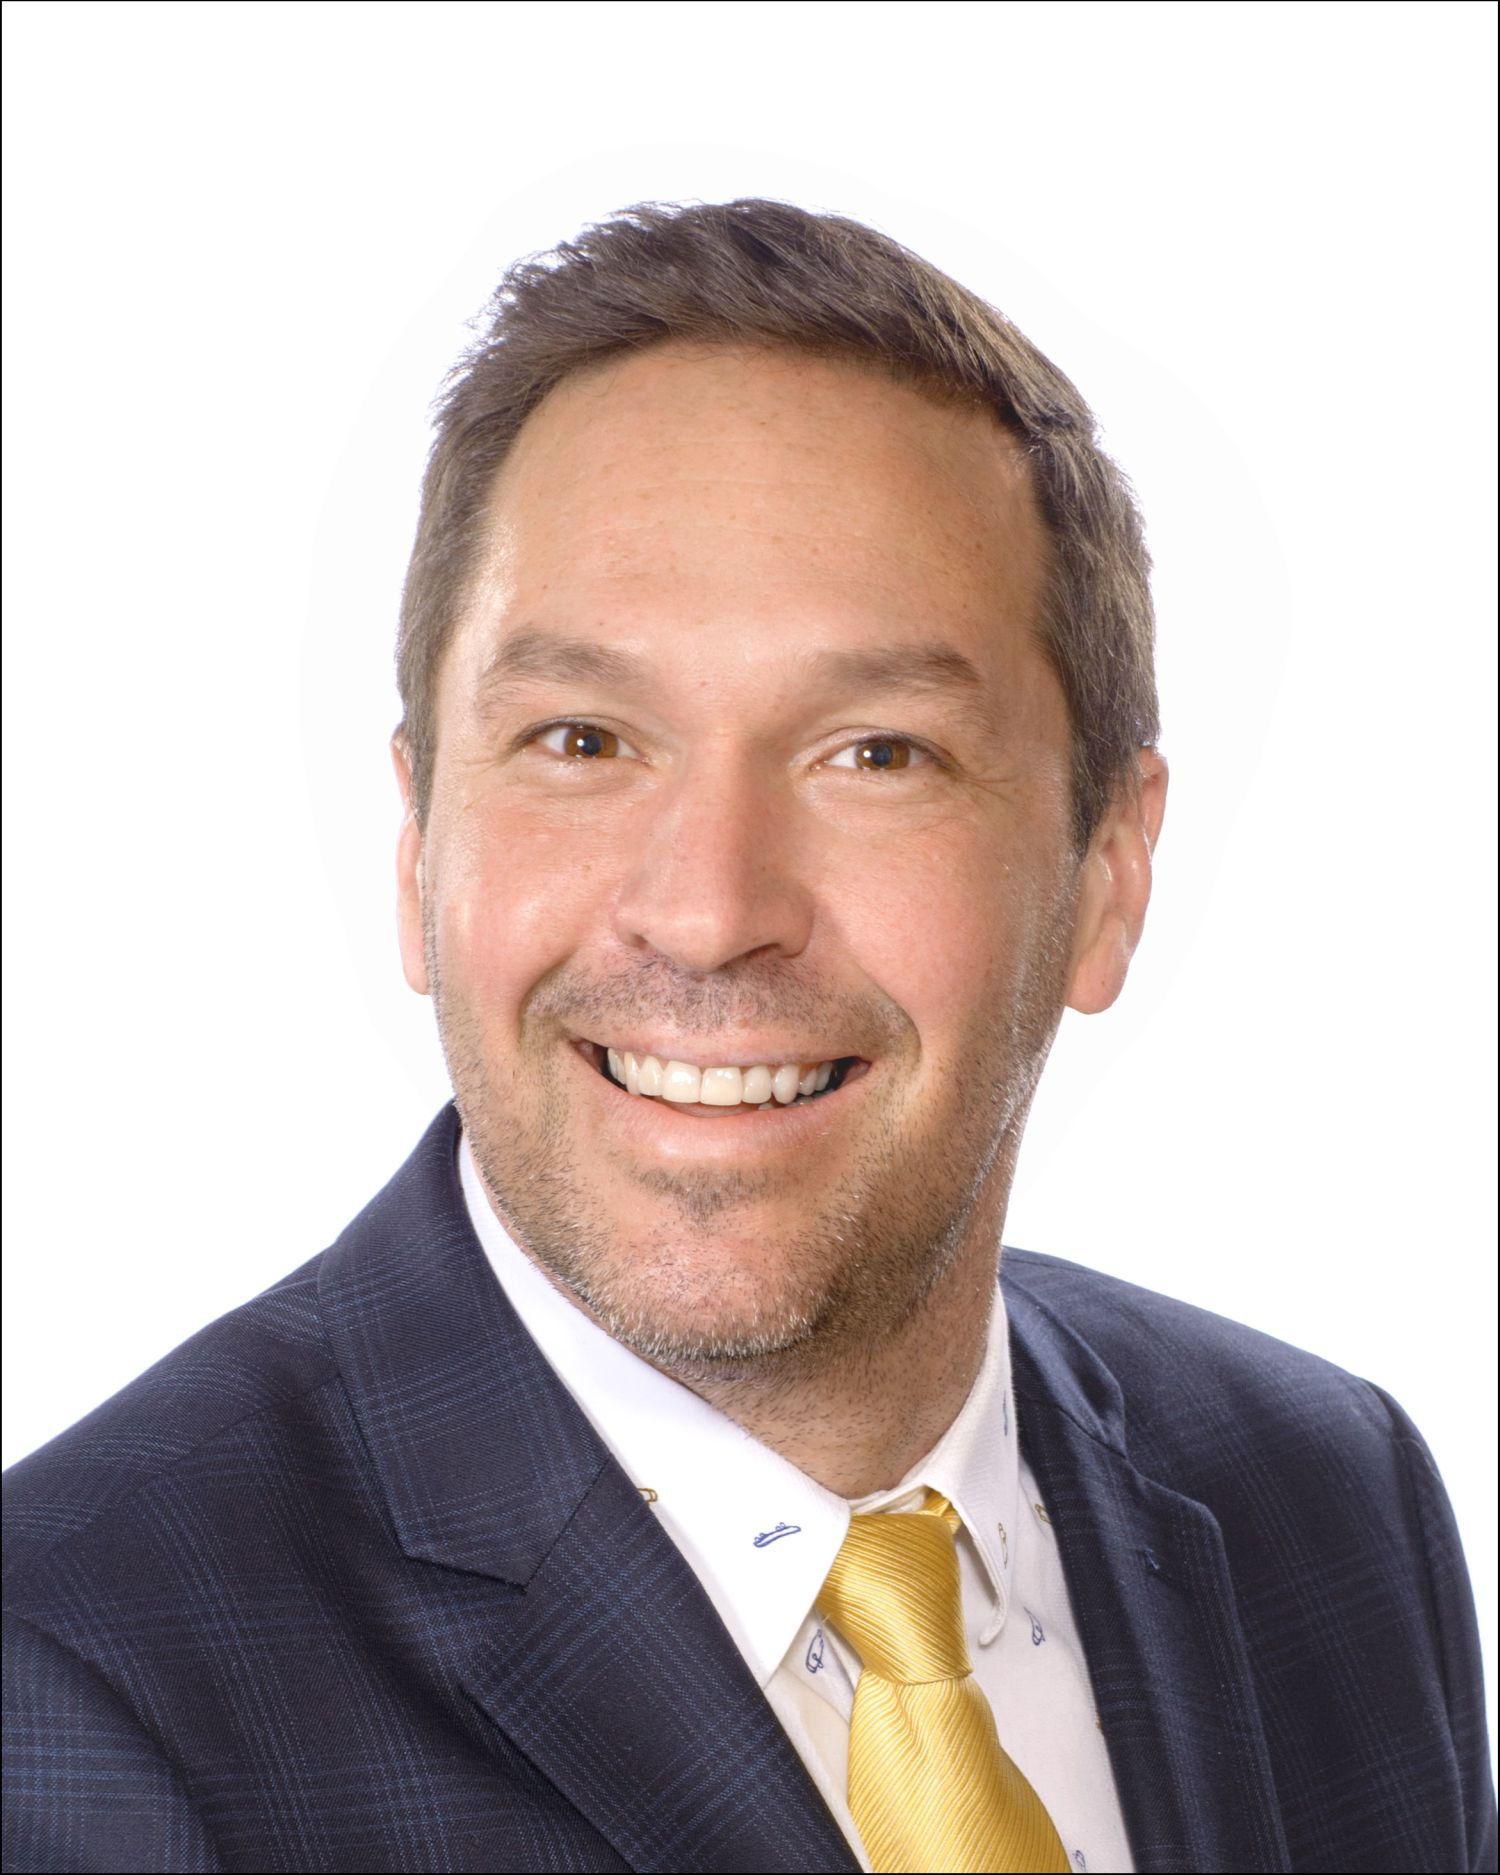 Frédéric Boulay, Courtier Immobilier - Quebec, QC